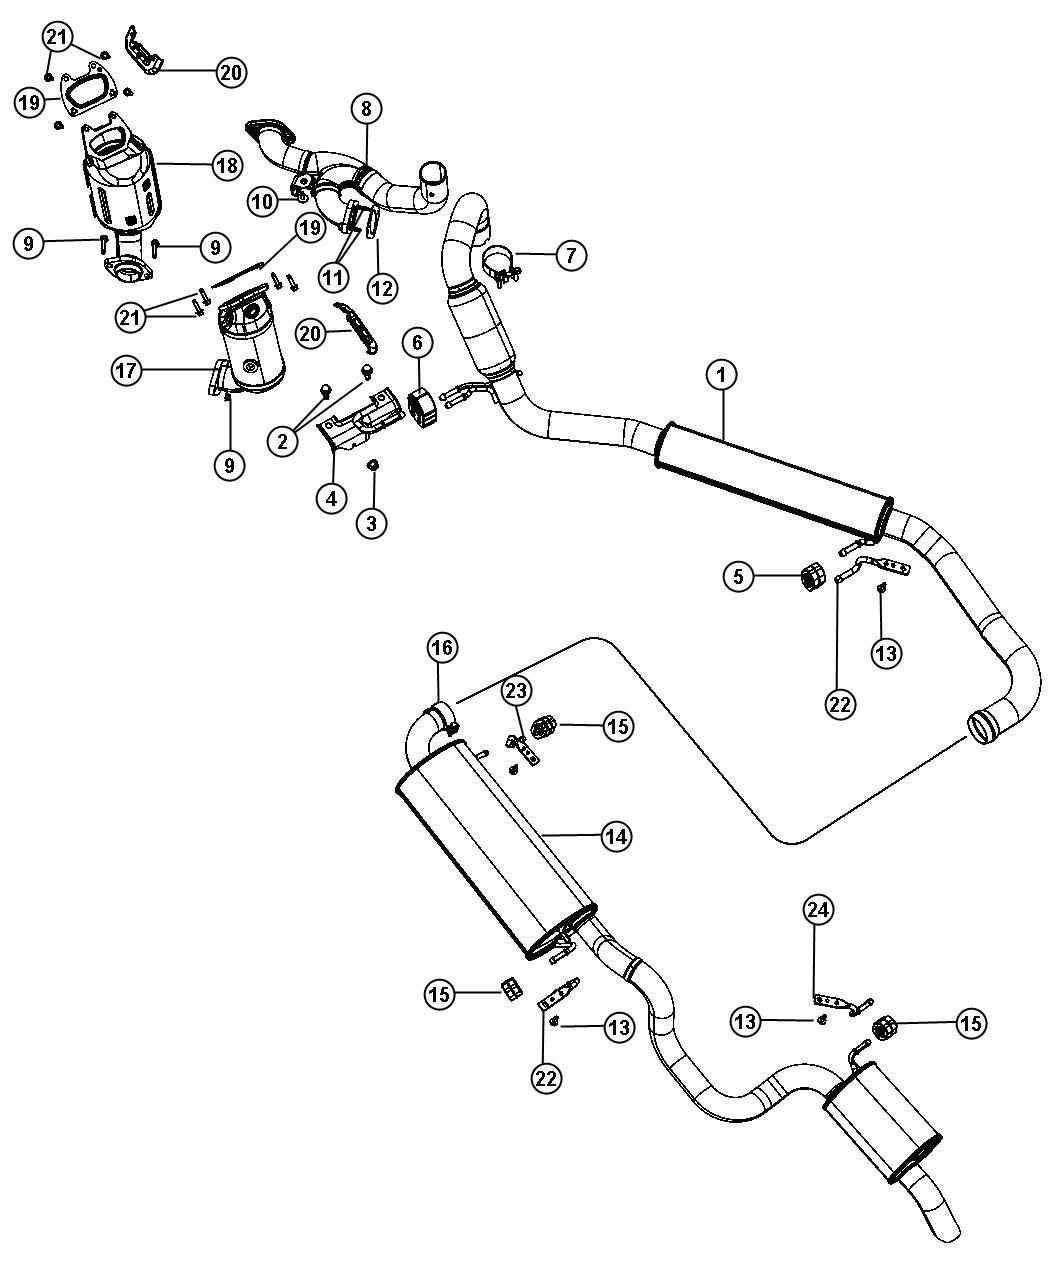 Dodge Grand Caravan Muffler And Resonator Exhaust